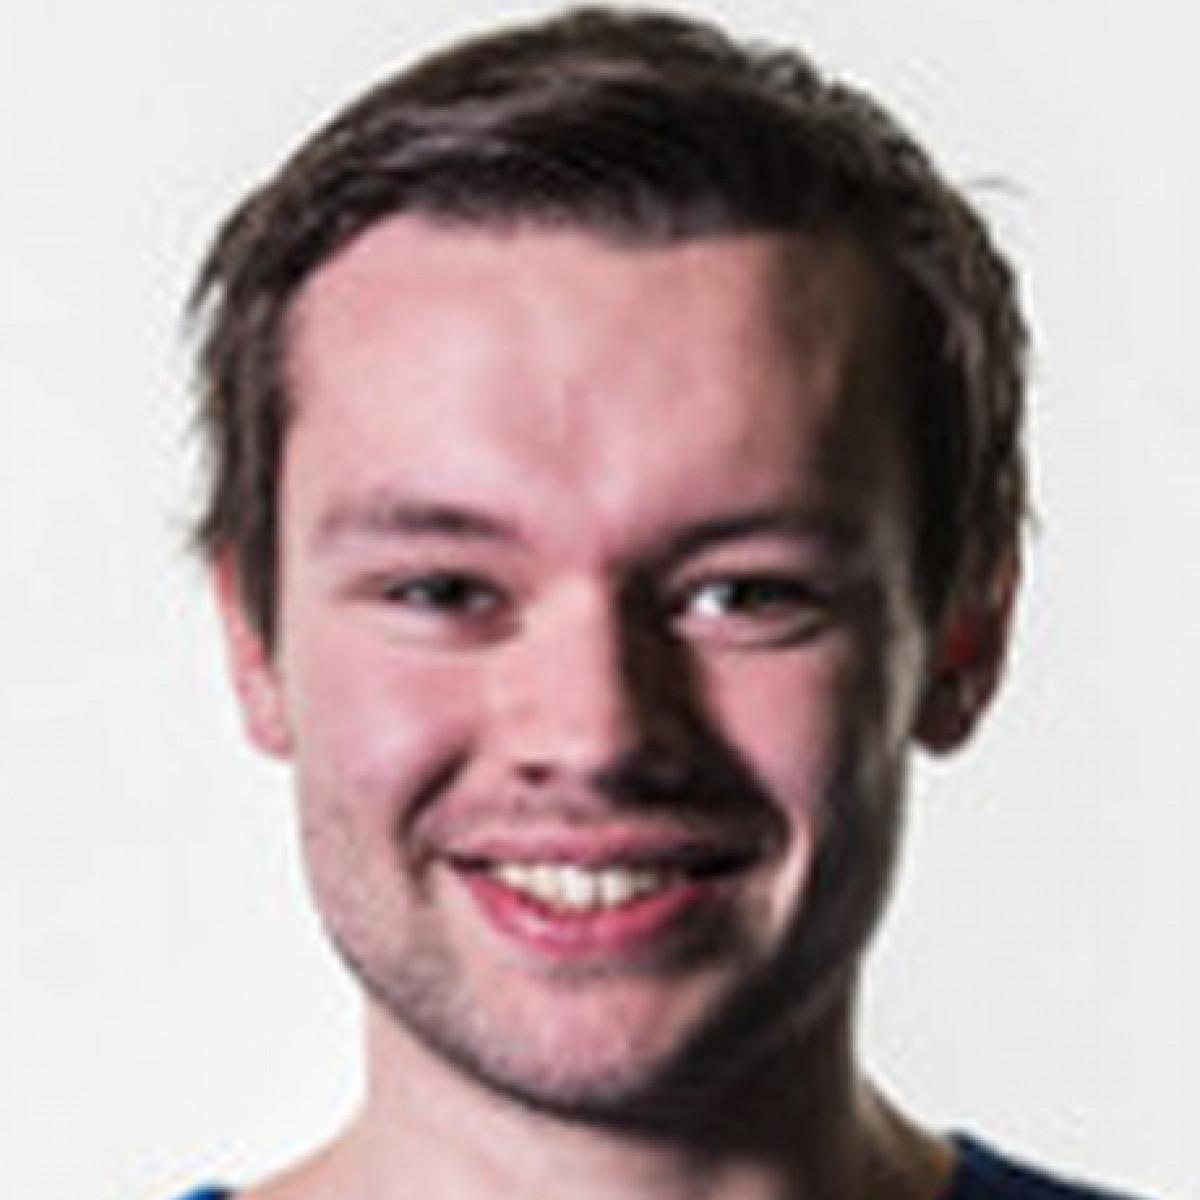 Tobias Opdahl